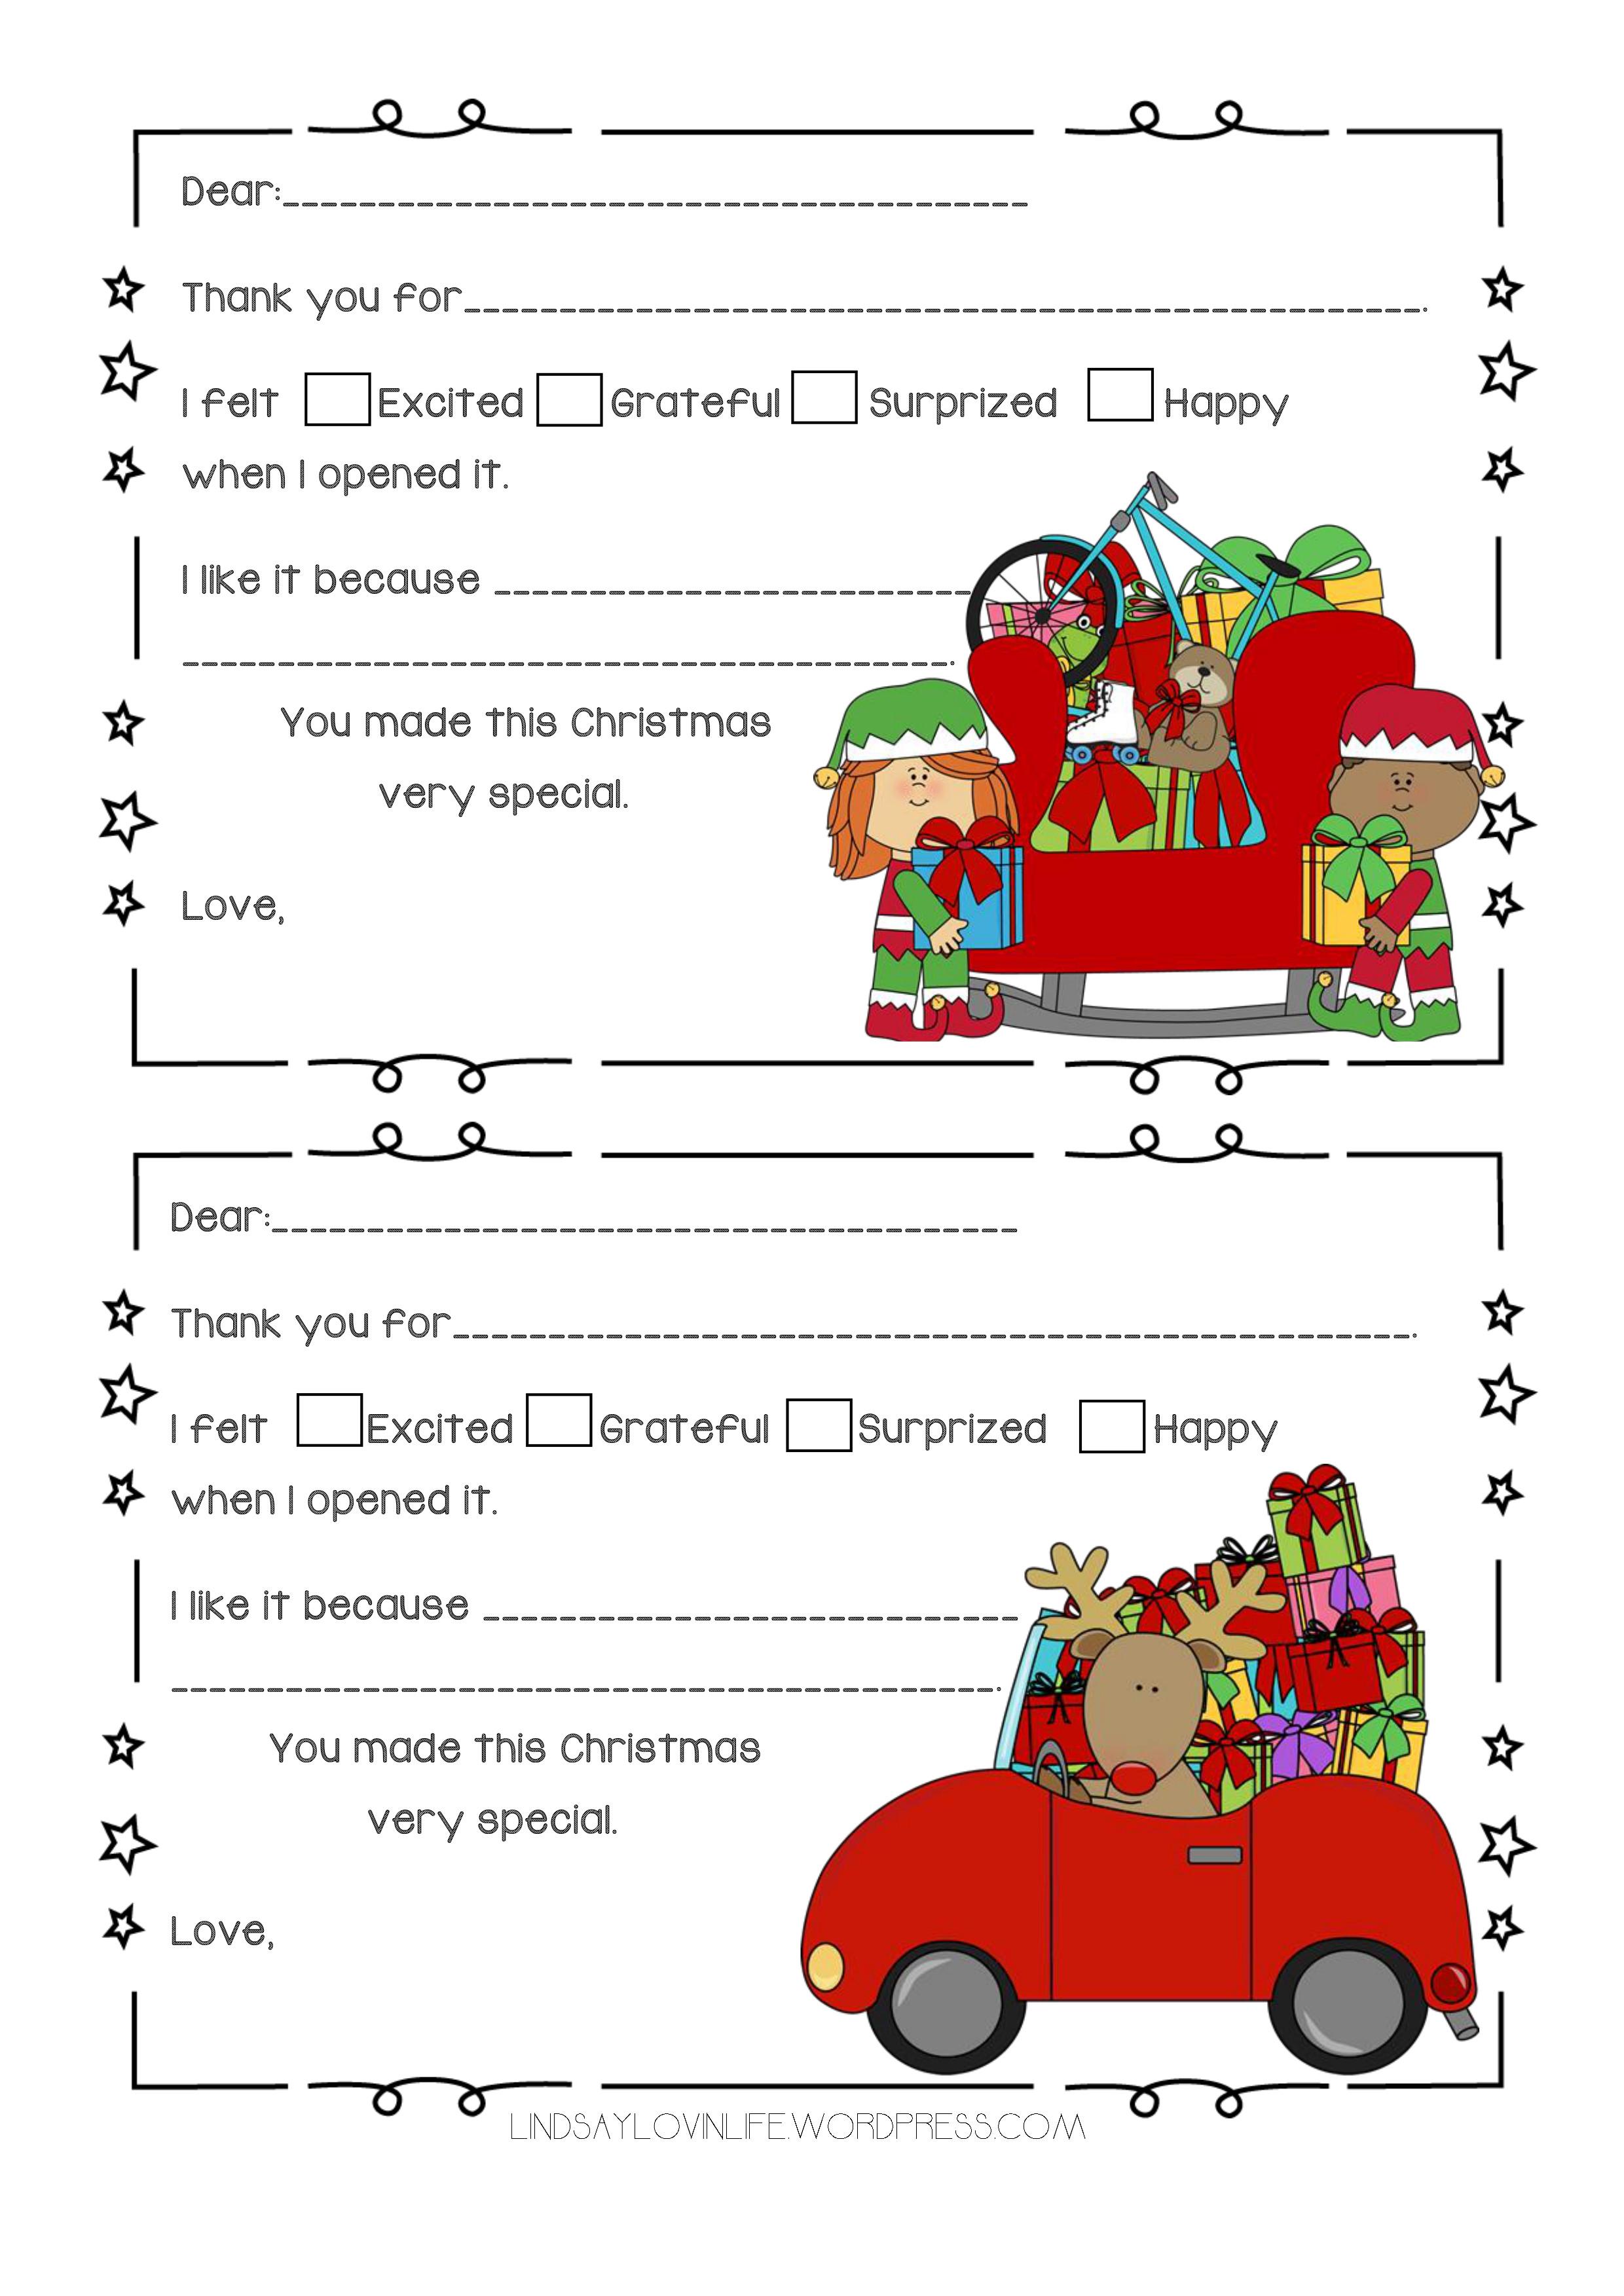 graphic regarding Christmas Thank You Notes Printable known as Blogmas Working day 6 Absolutely free Printable Xmas Reward Thank Oneself Notes